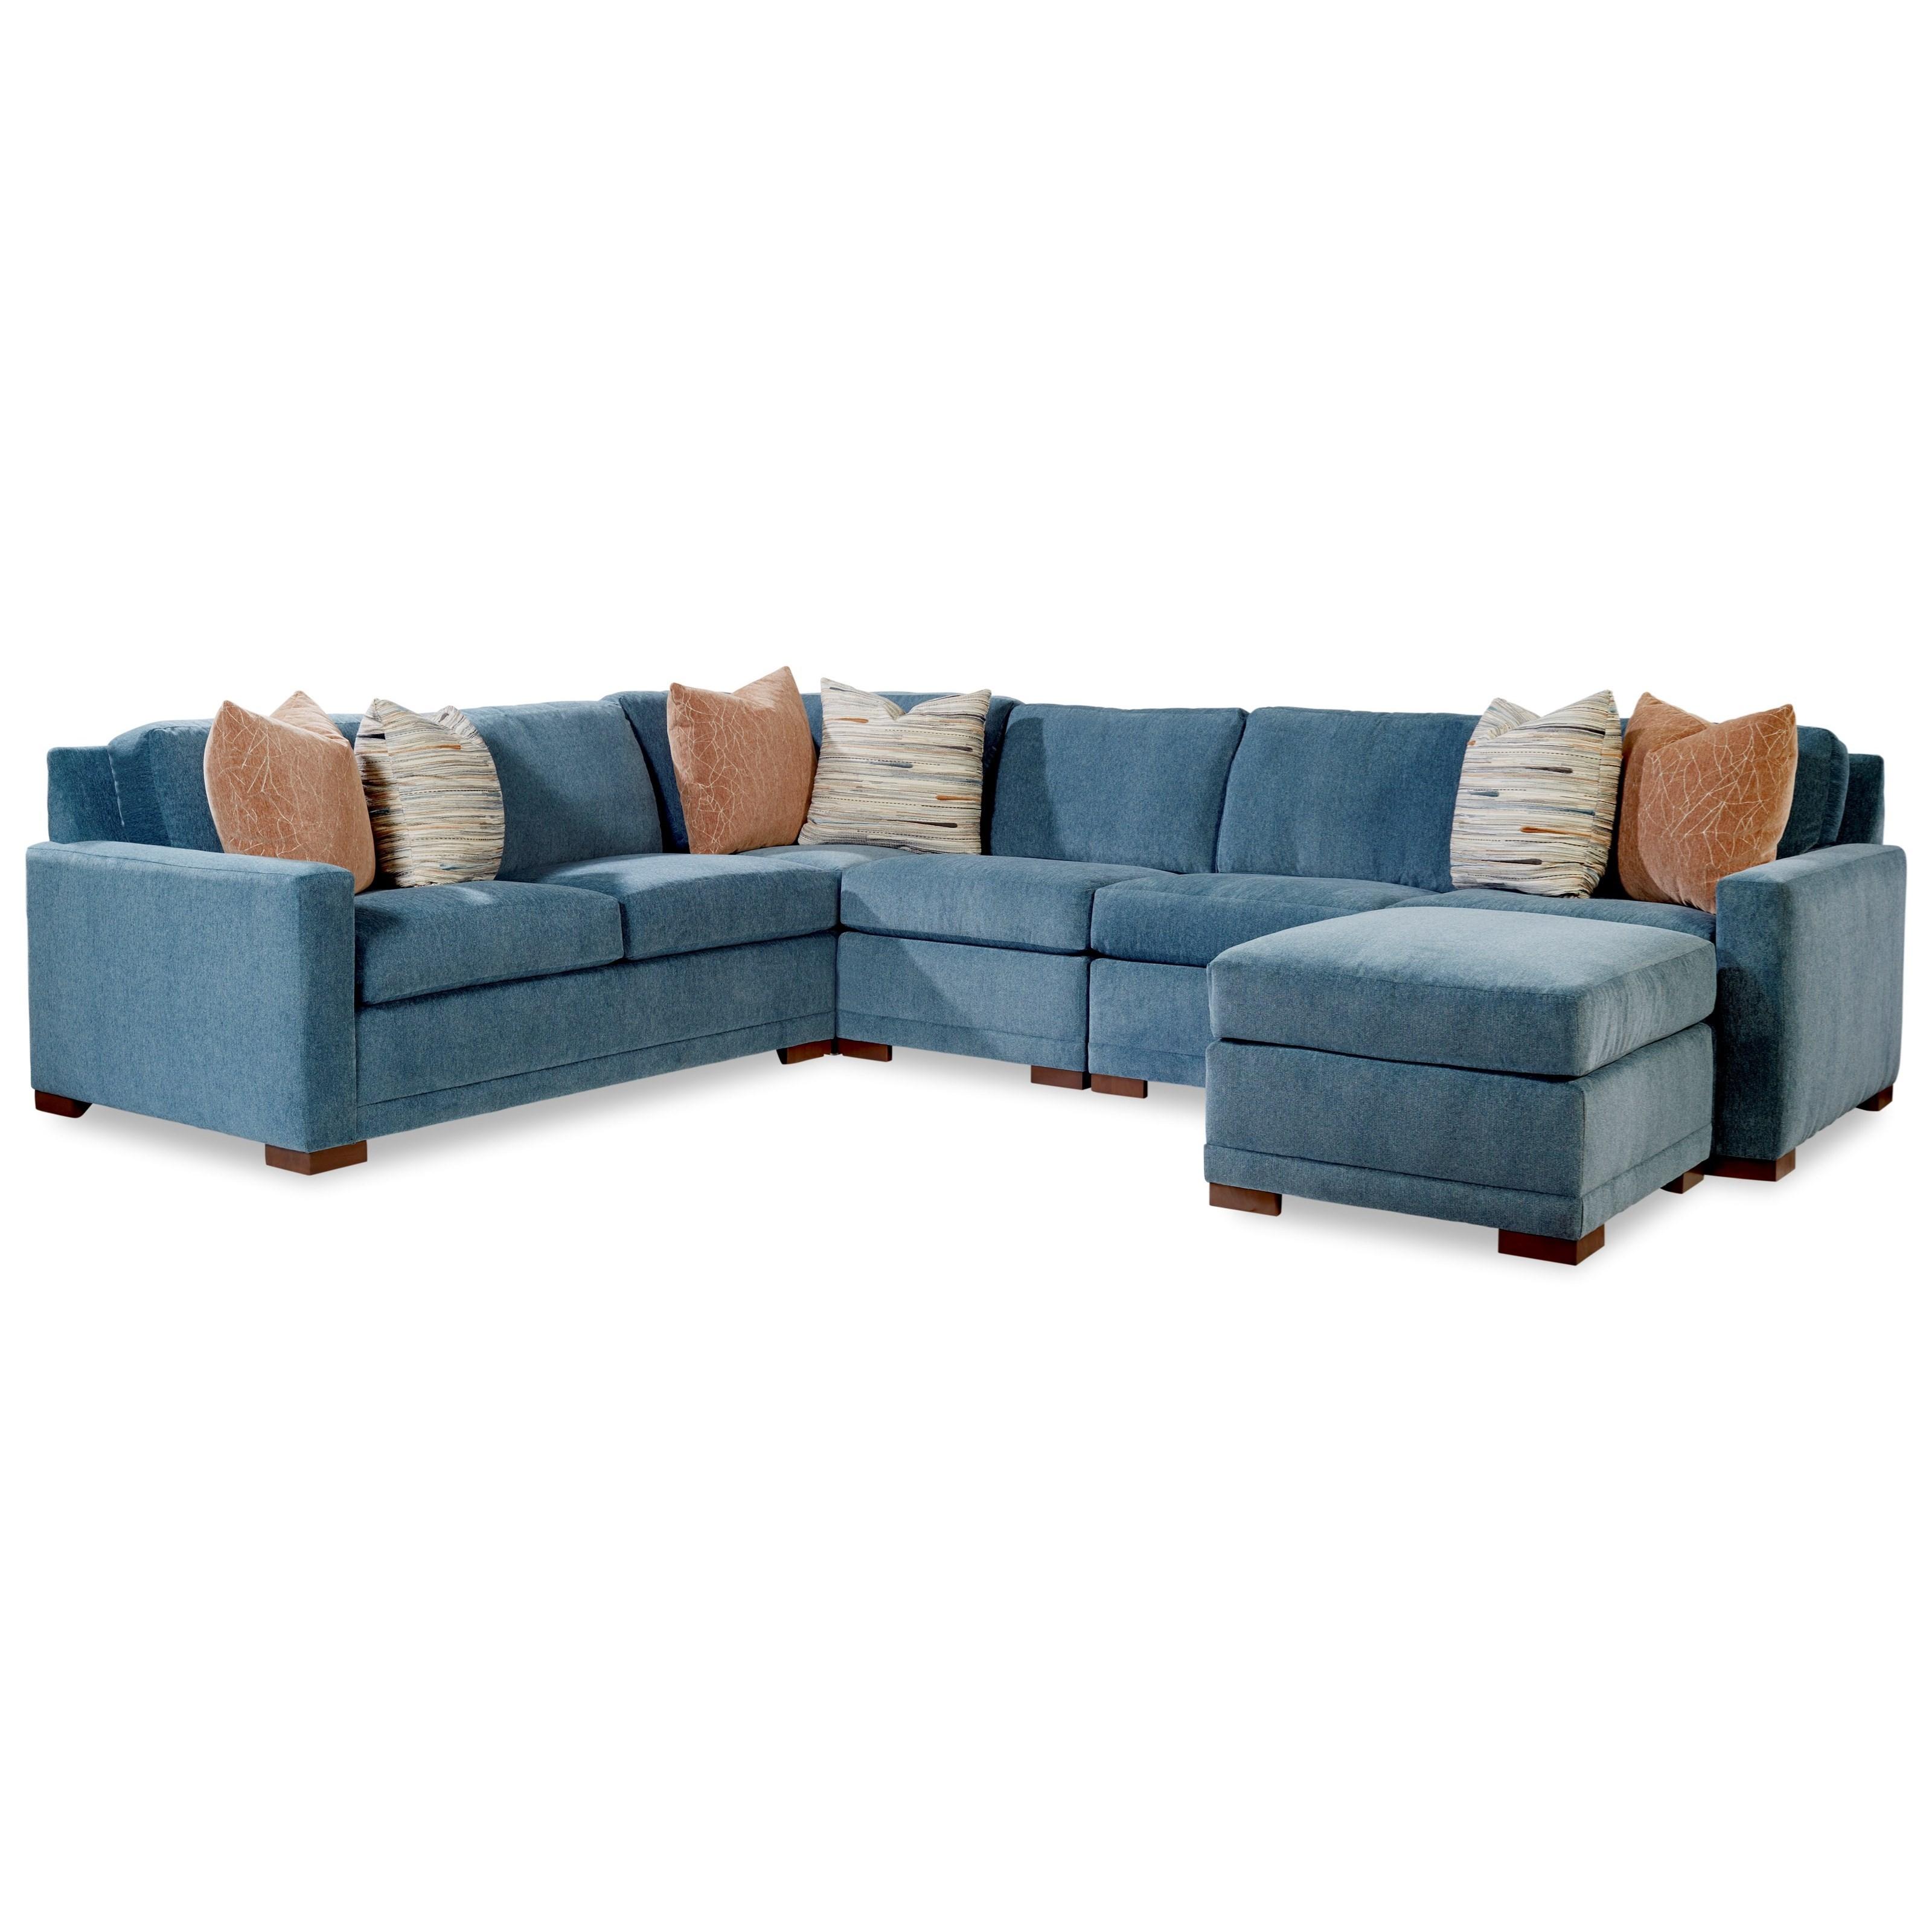 7290 Sectional by Geoffrey Alexander at Sprintz Furniture